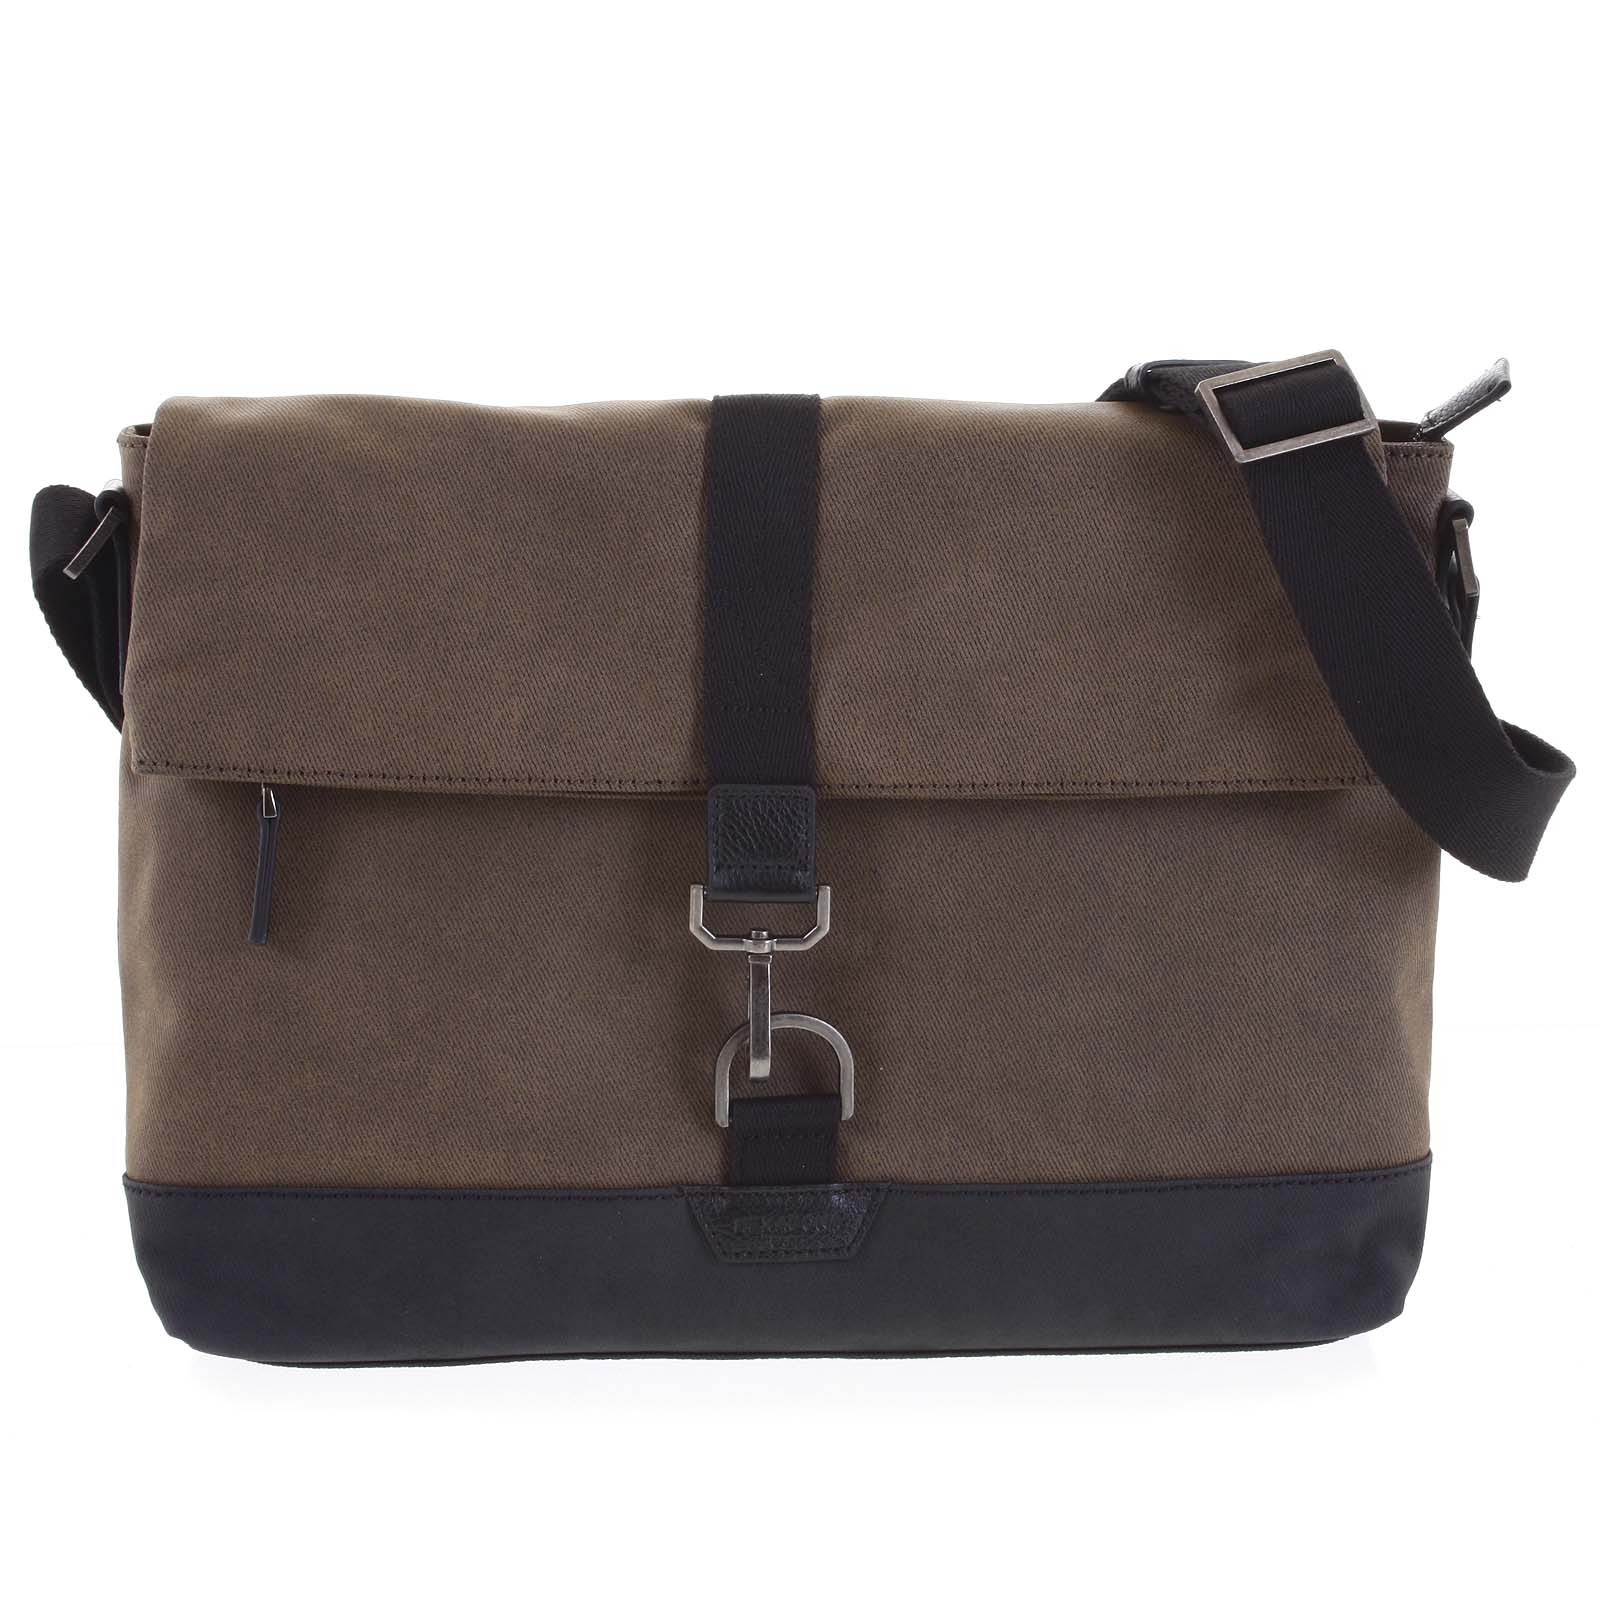 Pánská taška na notebook hnědá - Hexagona Cladrien